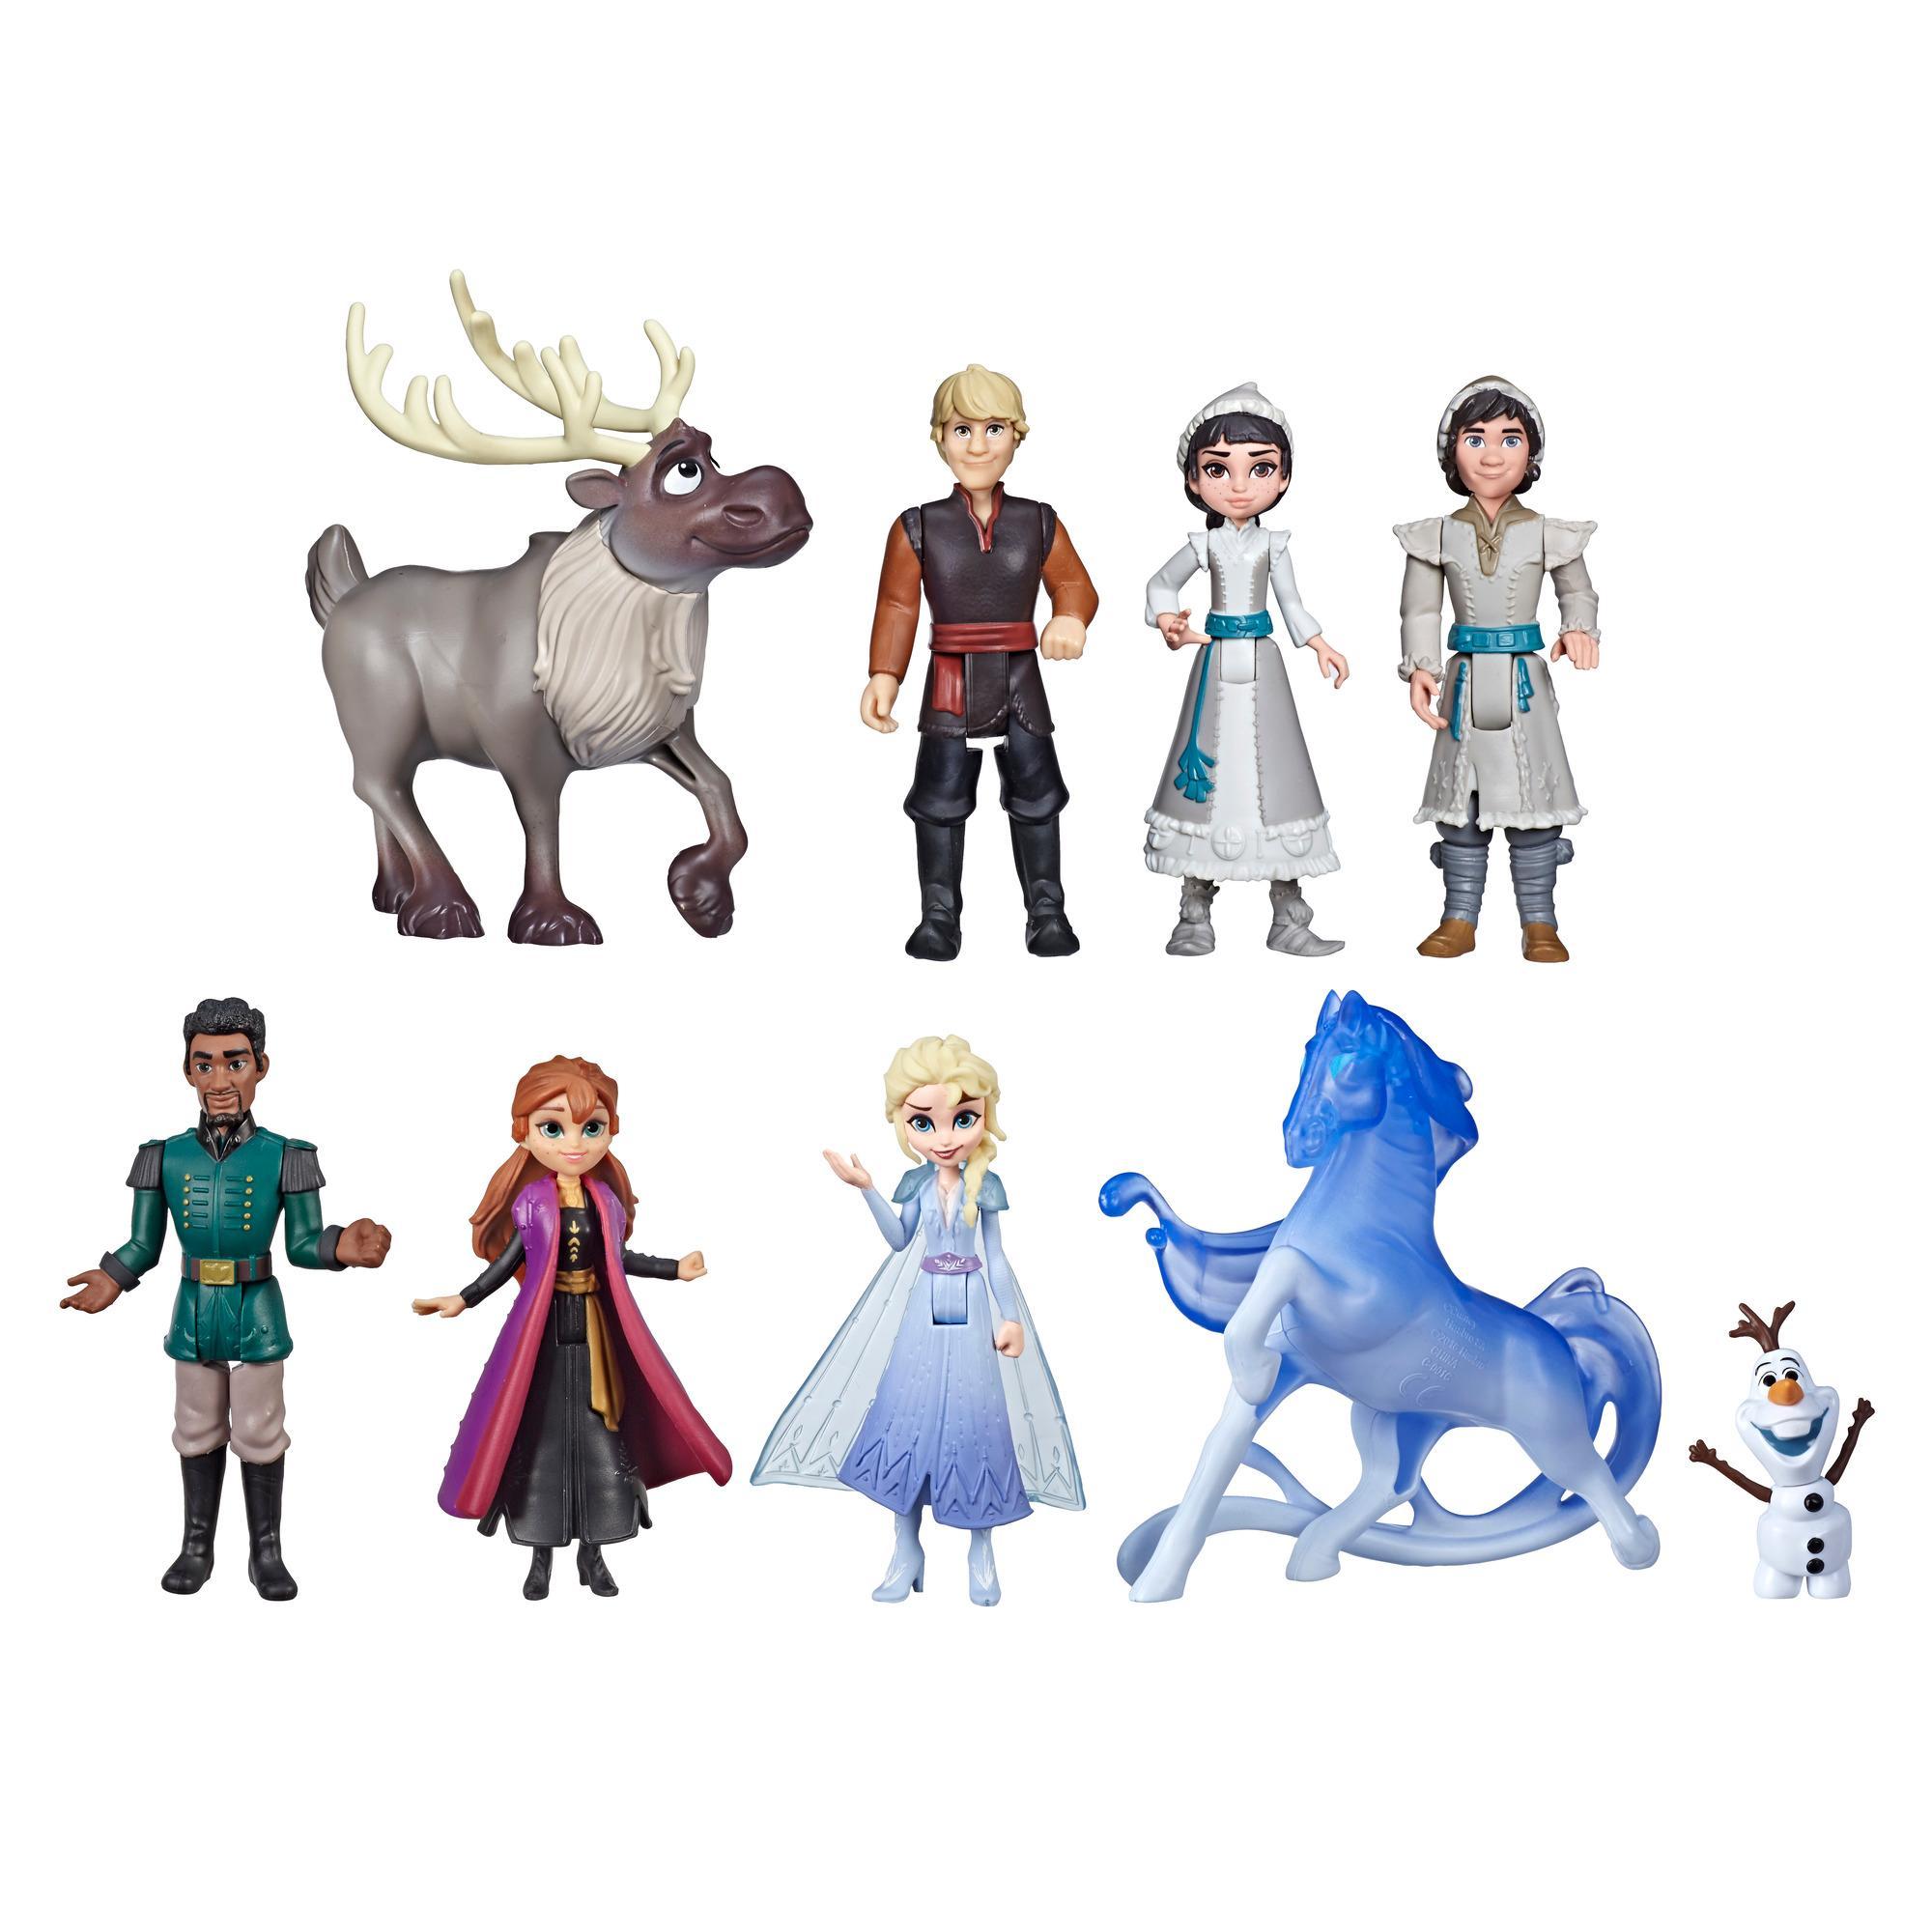 Disney Frozen 2 Ultimate Frozen Collection